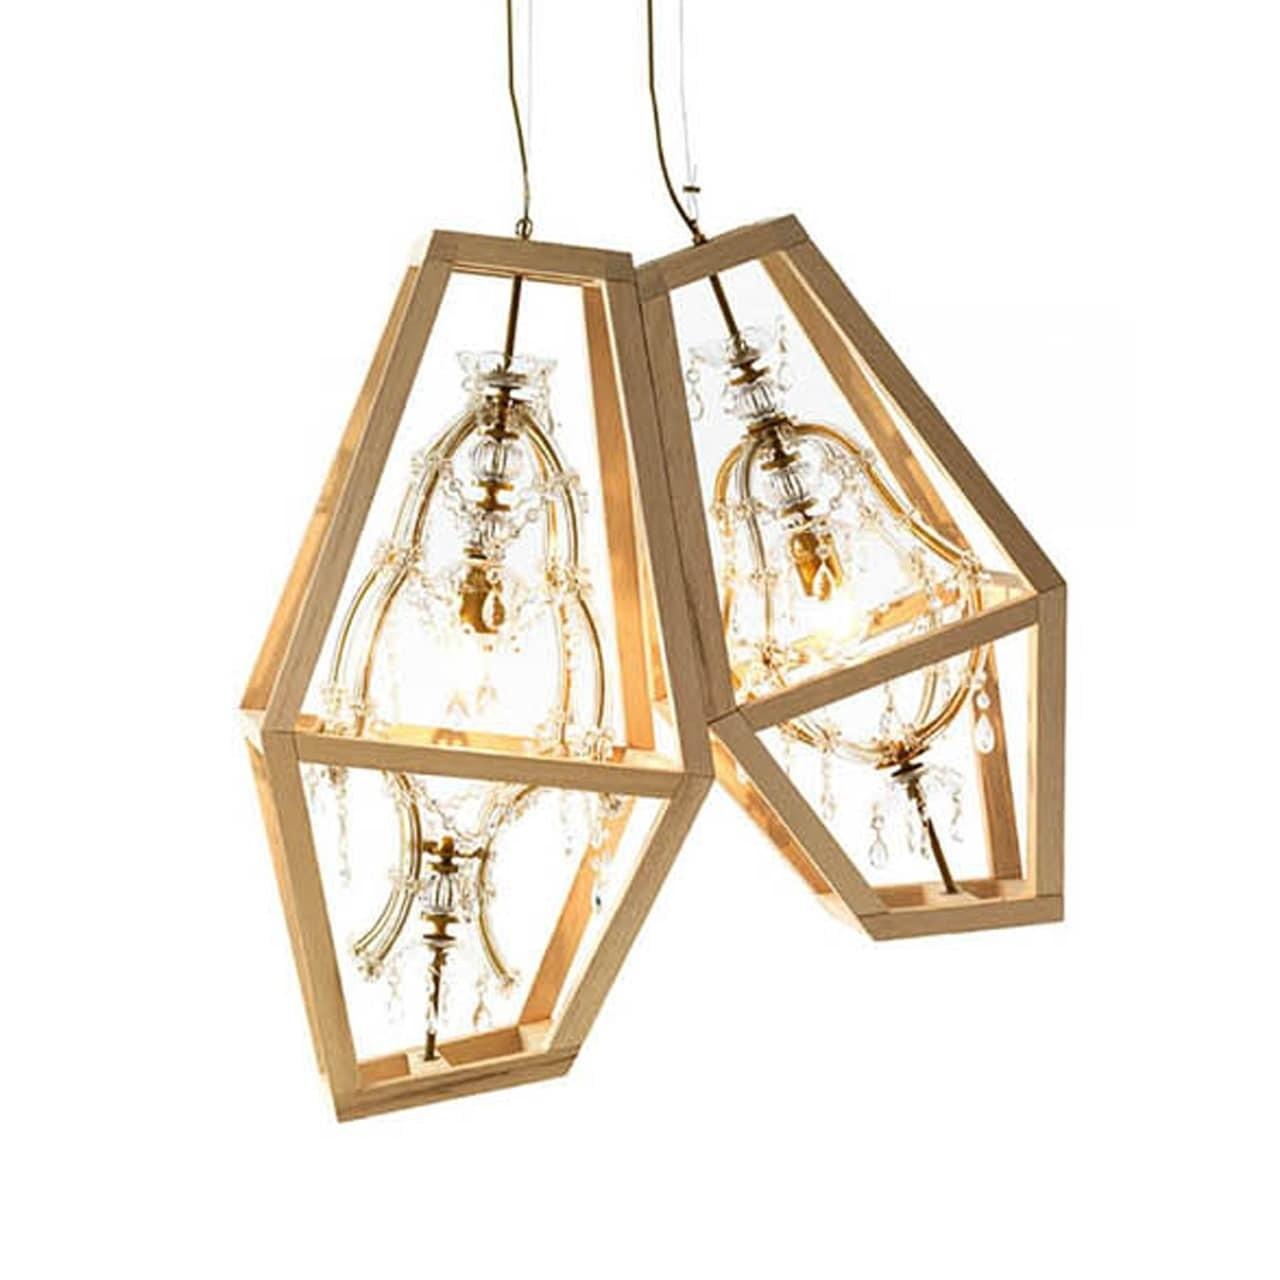 Mogg CRYSTAL |lampada a sospensione|